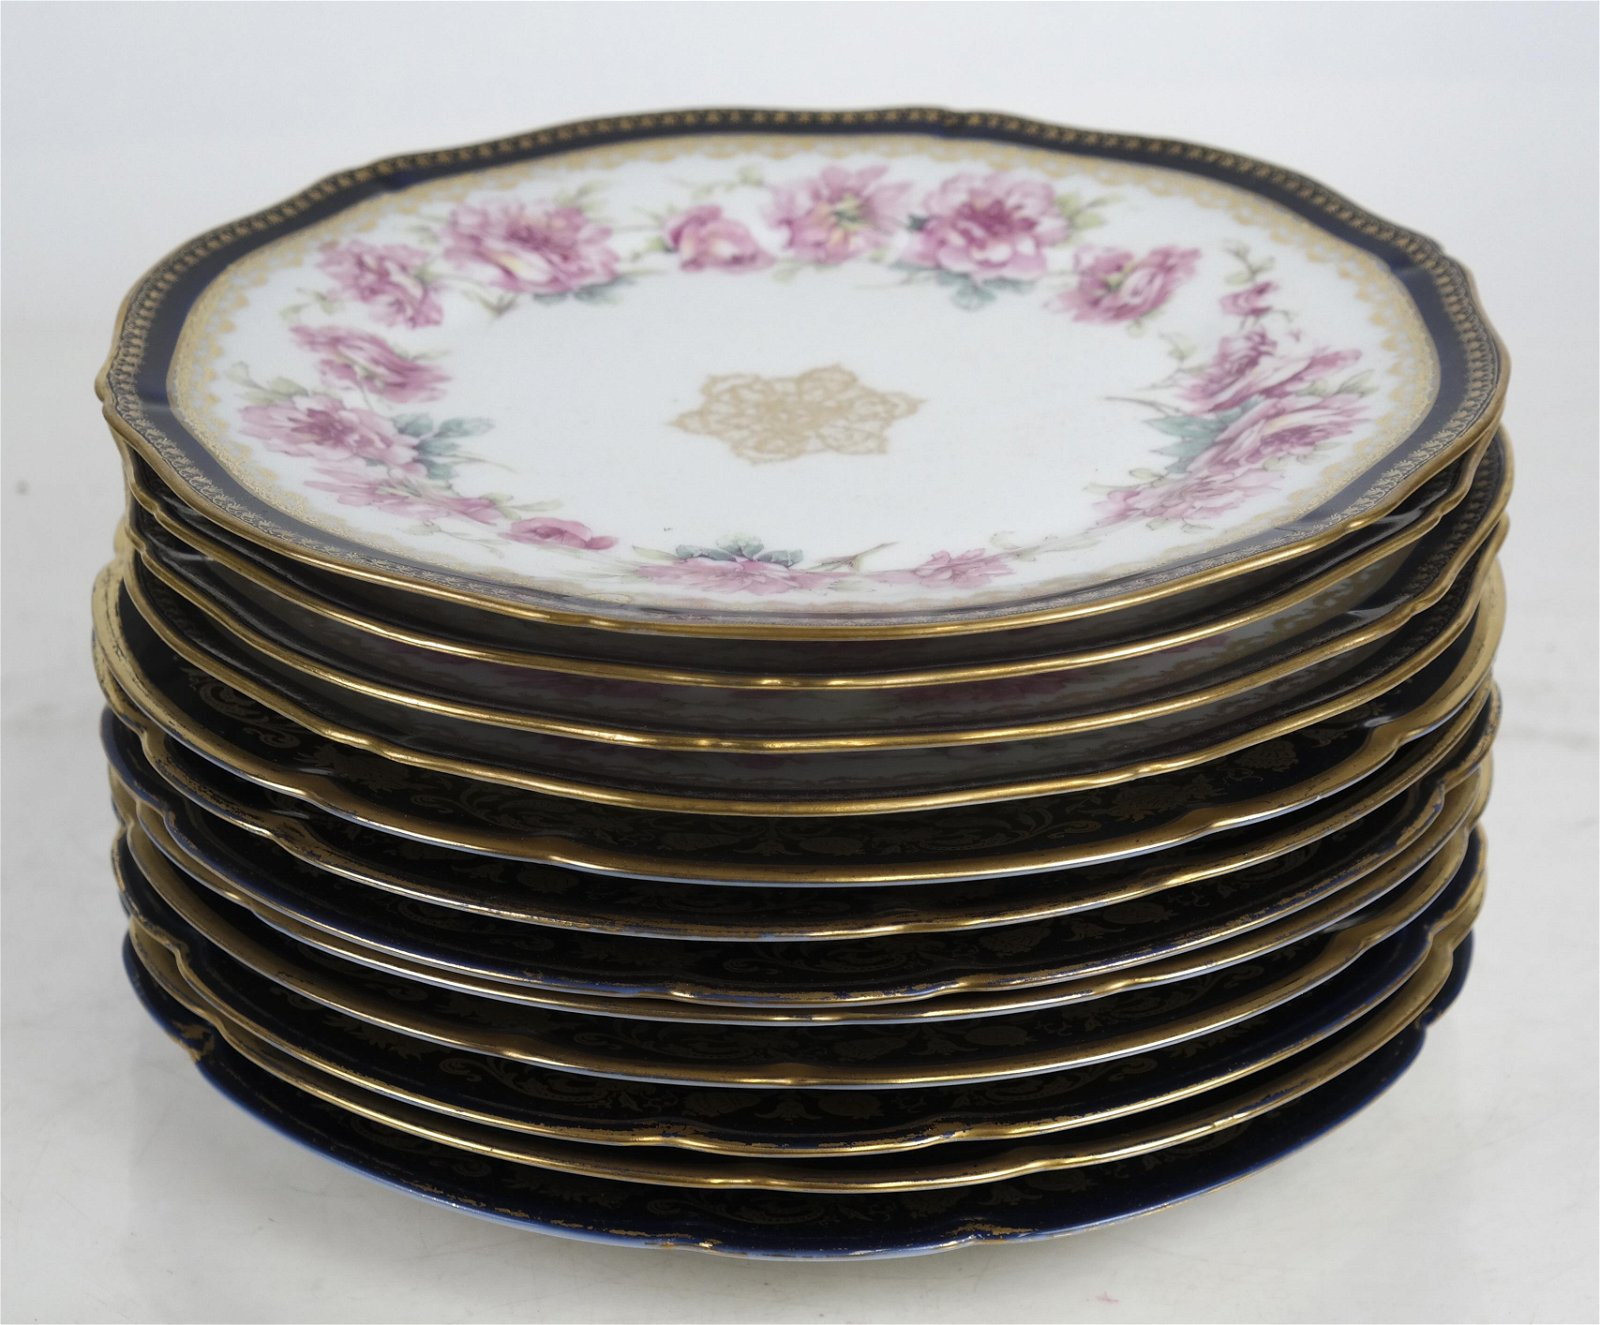 French limoges porcelain side or tea plates 10 gold and black decorated dessert plates